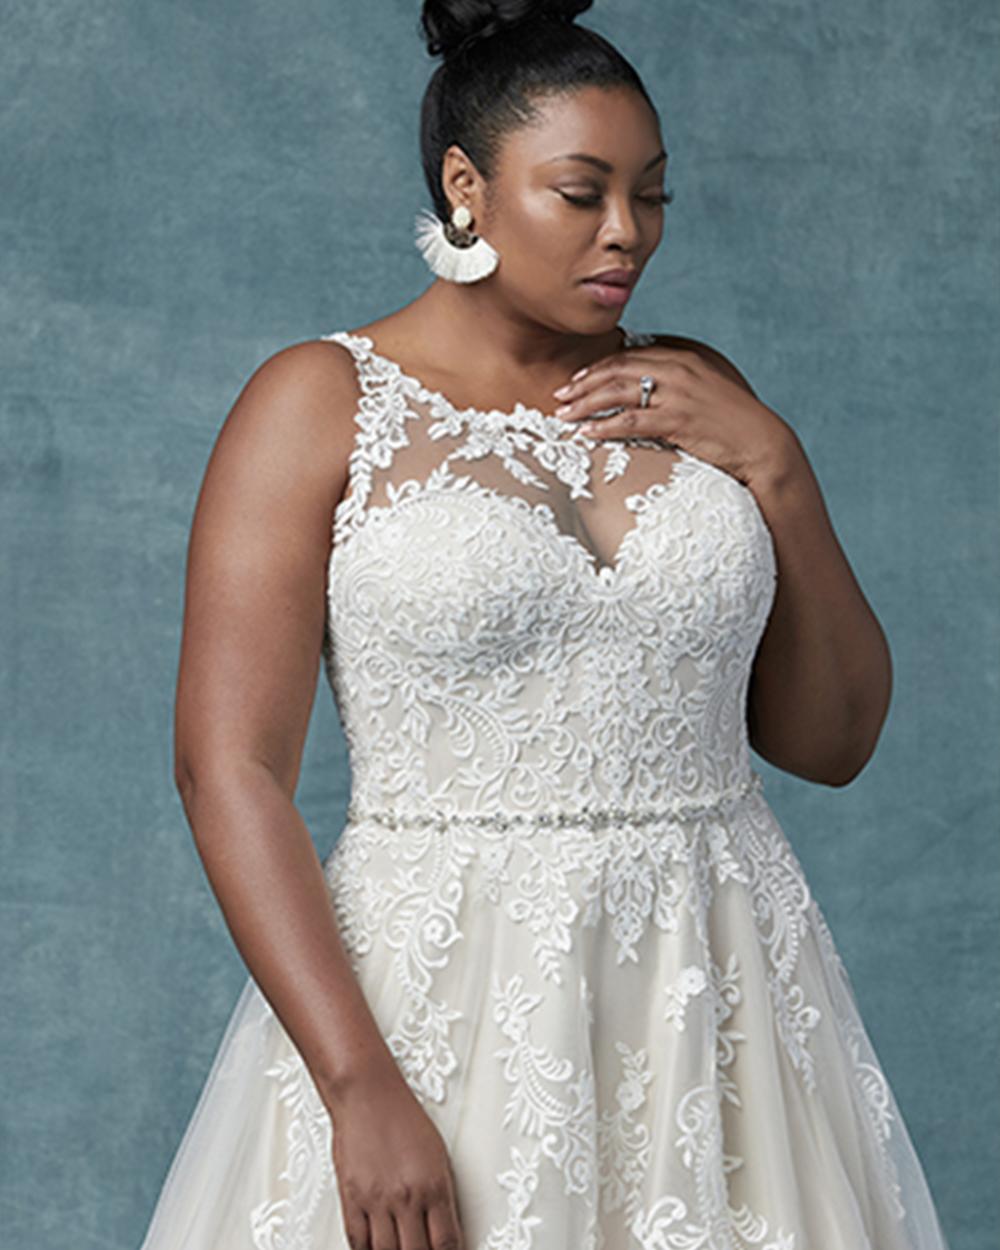 plus-size-wedding-dresses-maggie-sottero-j-andrews.png